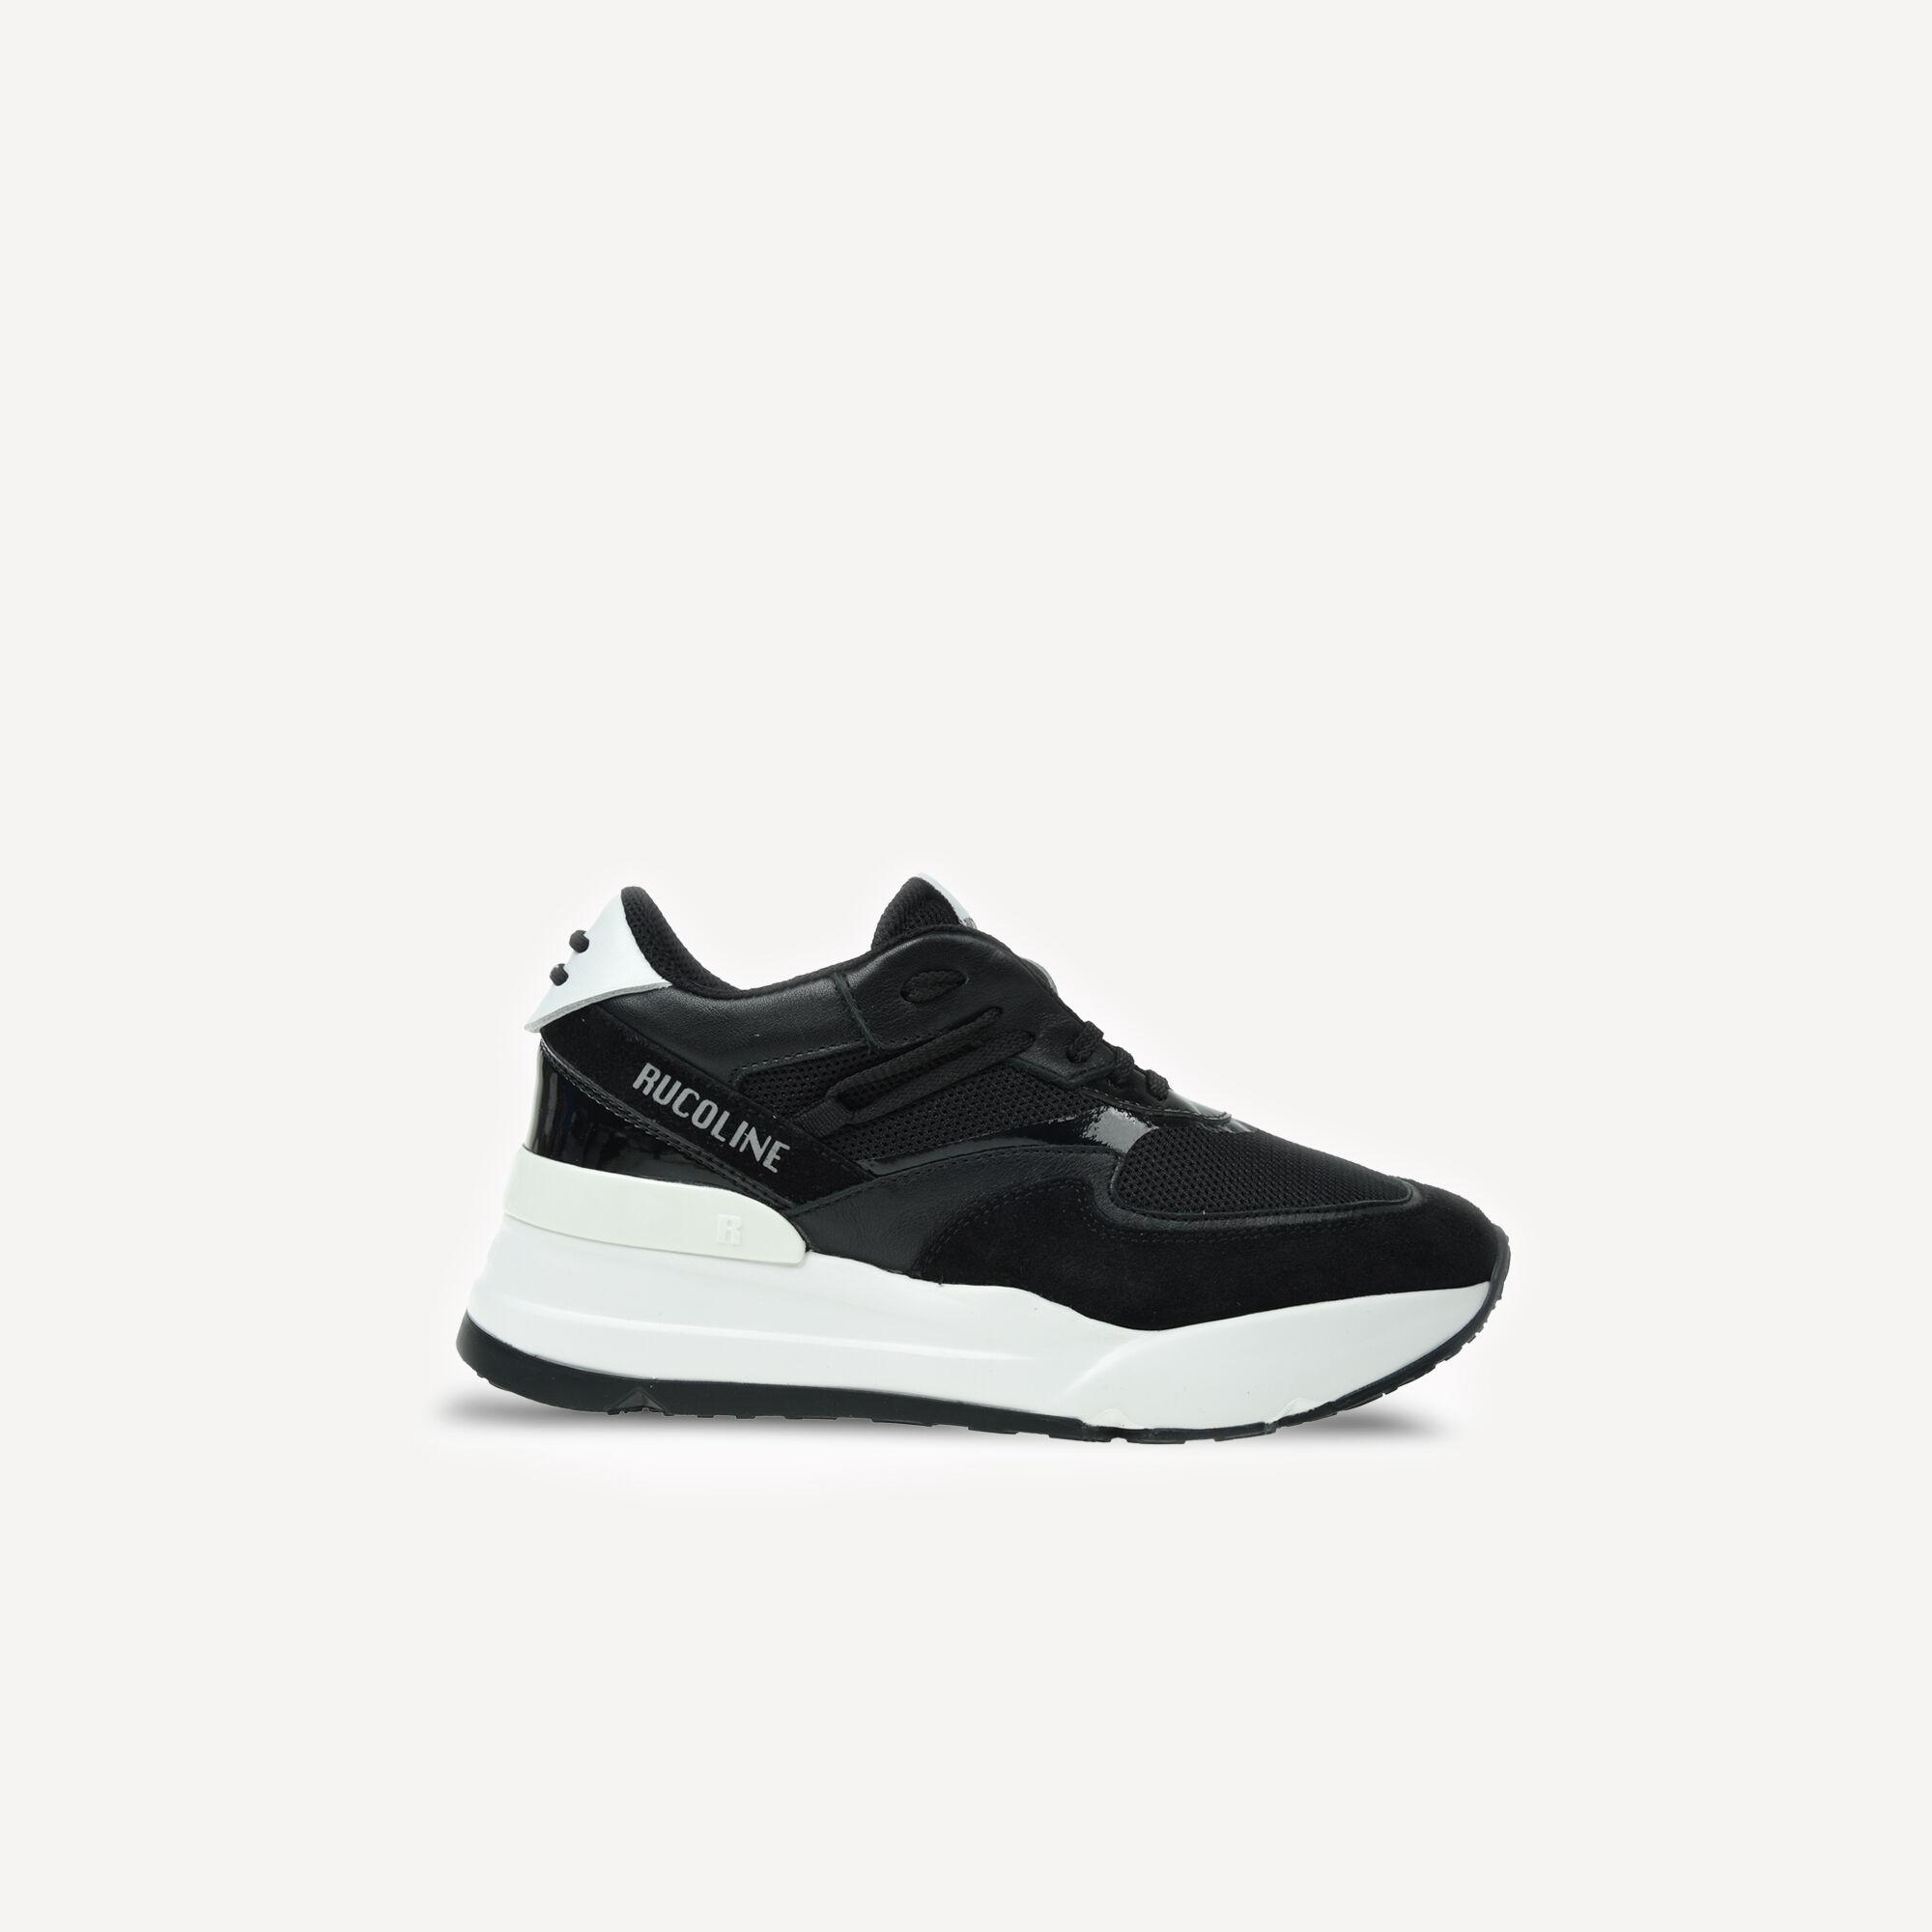 Outlet Schuhe und Accessoires | Rucoline